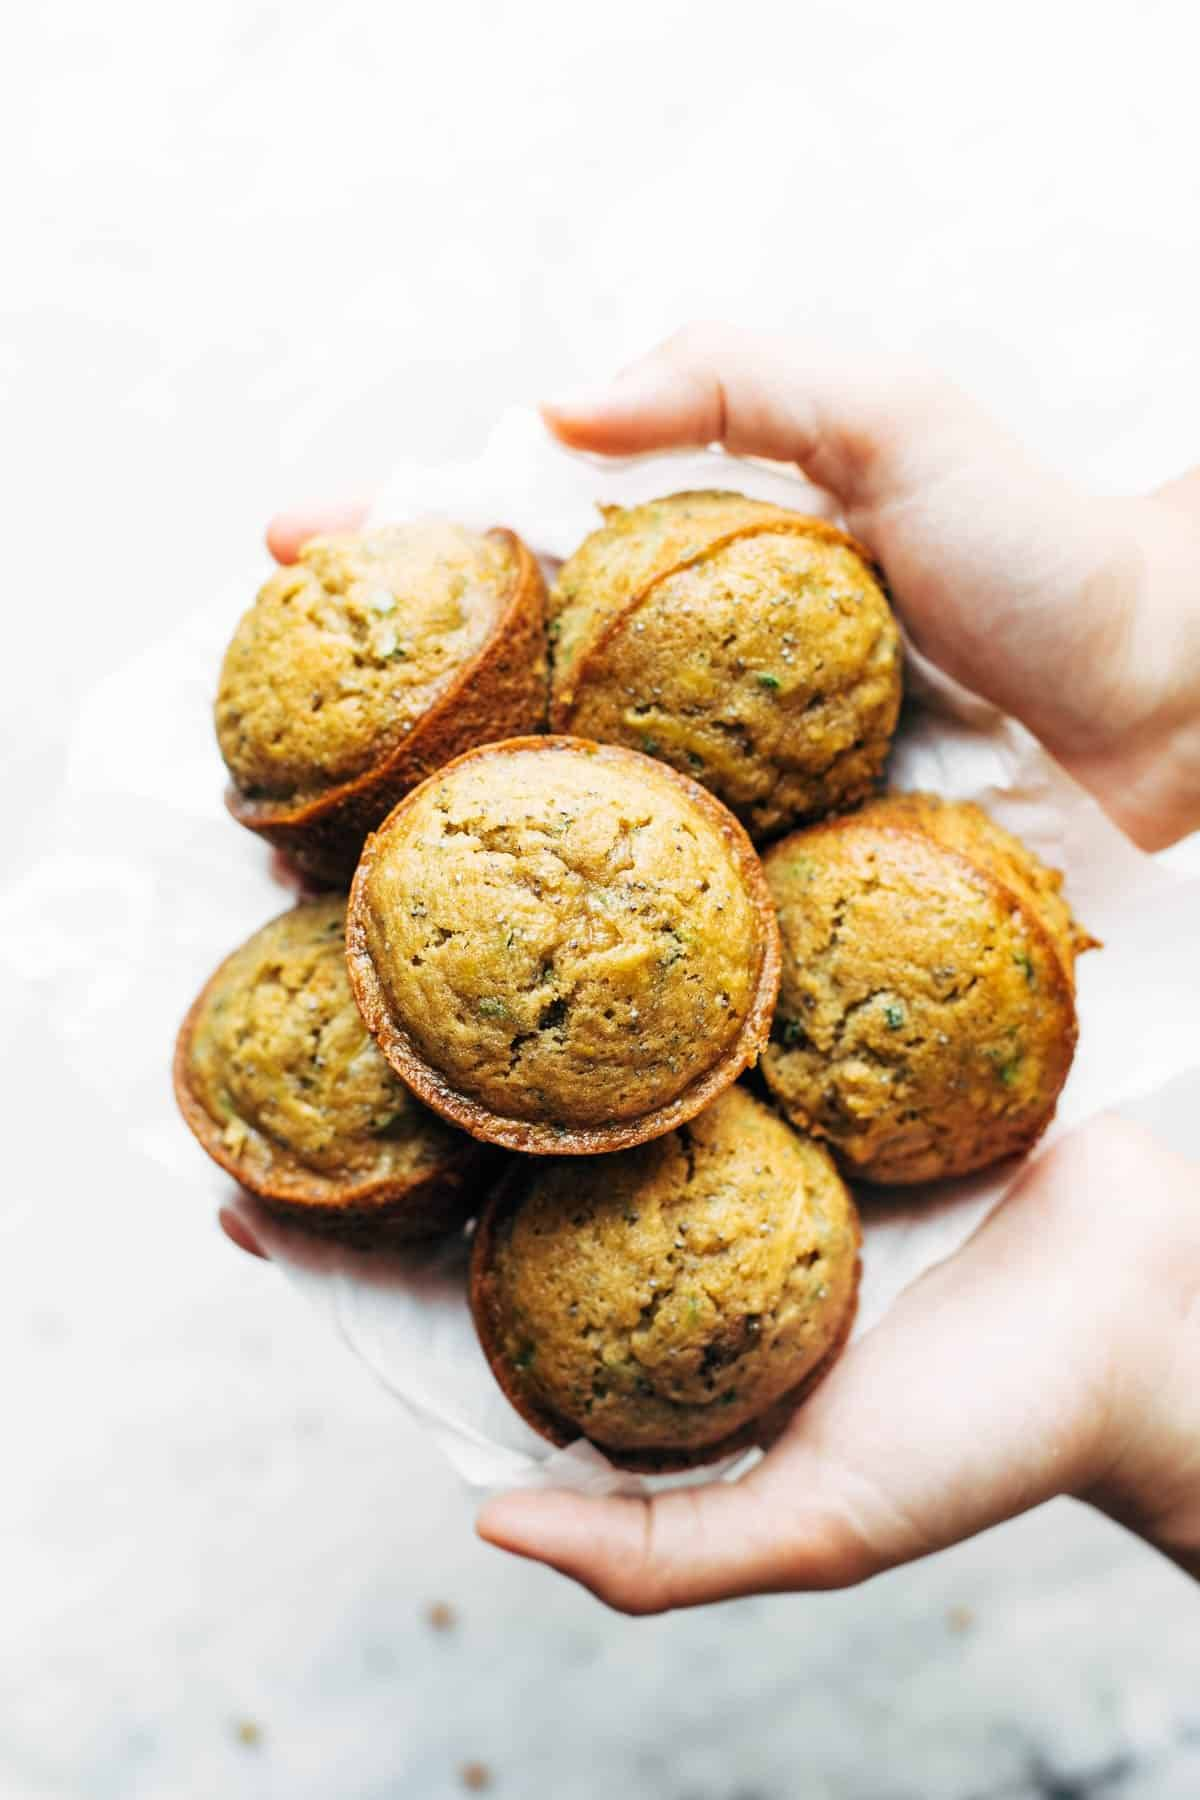 Lemon poppyseed zucchini muffins held by hands.